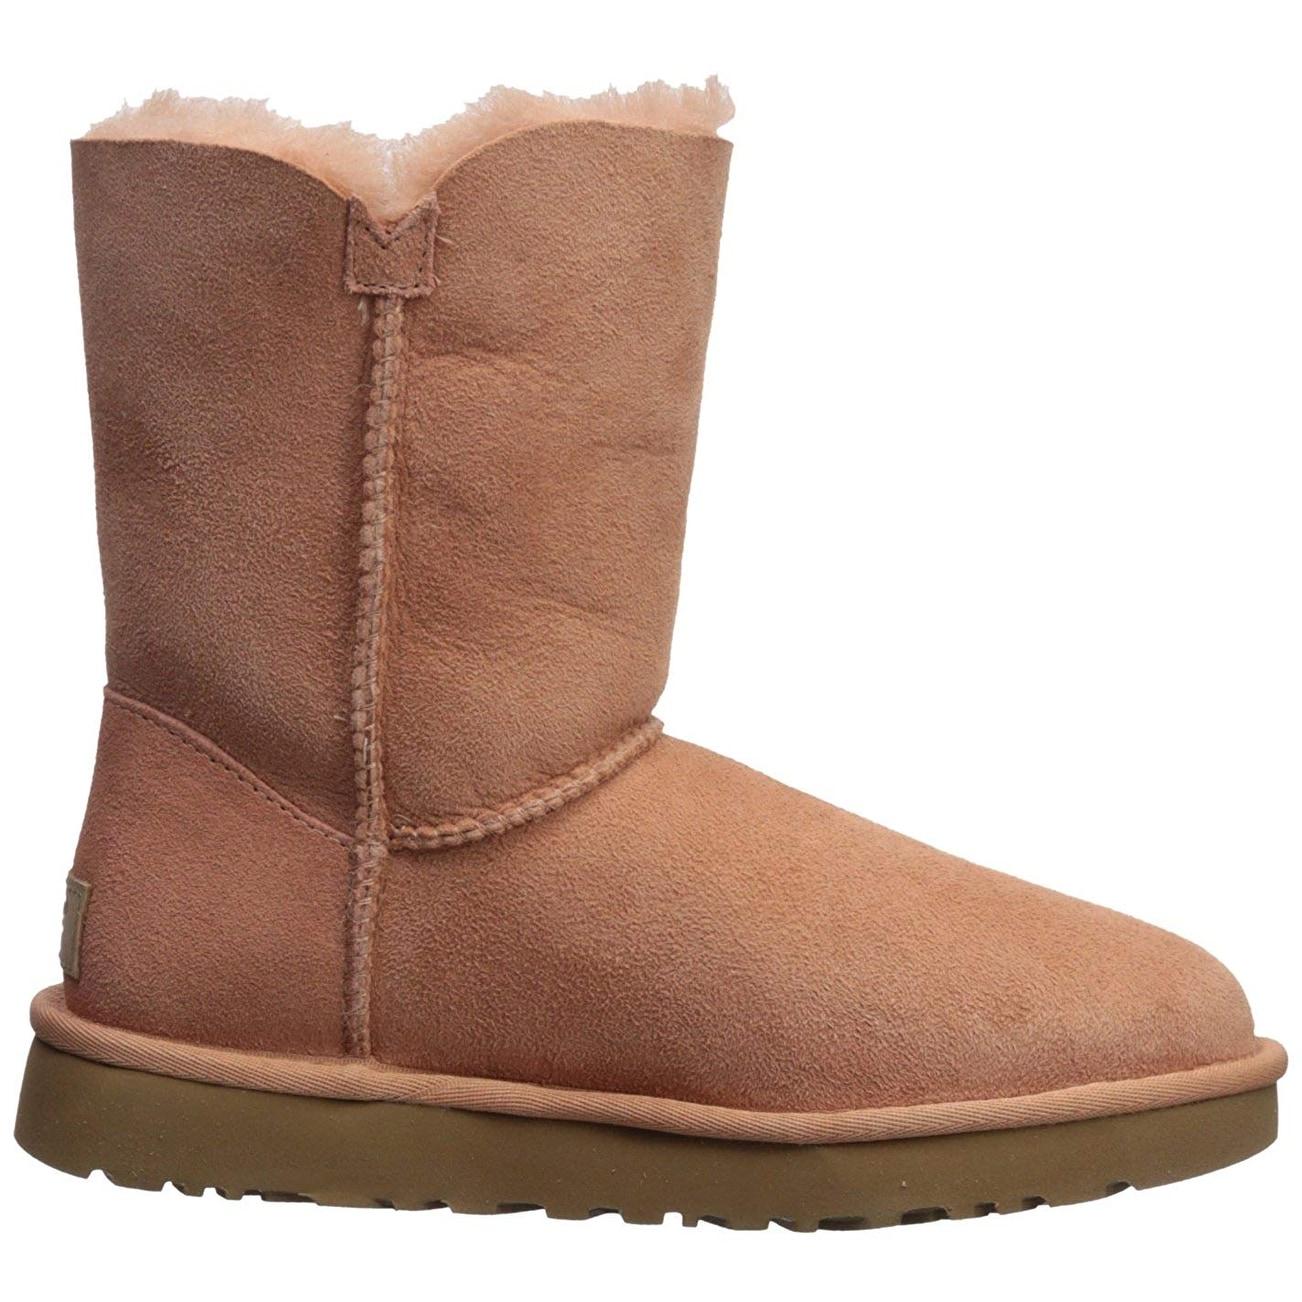 31fa79584 Shop UGG Women's Bailey Button II Fashion Boot - 7 - Free Shipping Today -  Overstock - 22827587